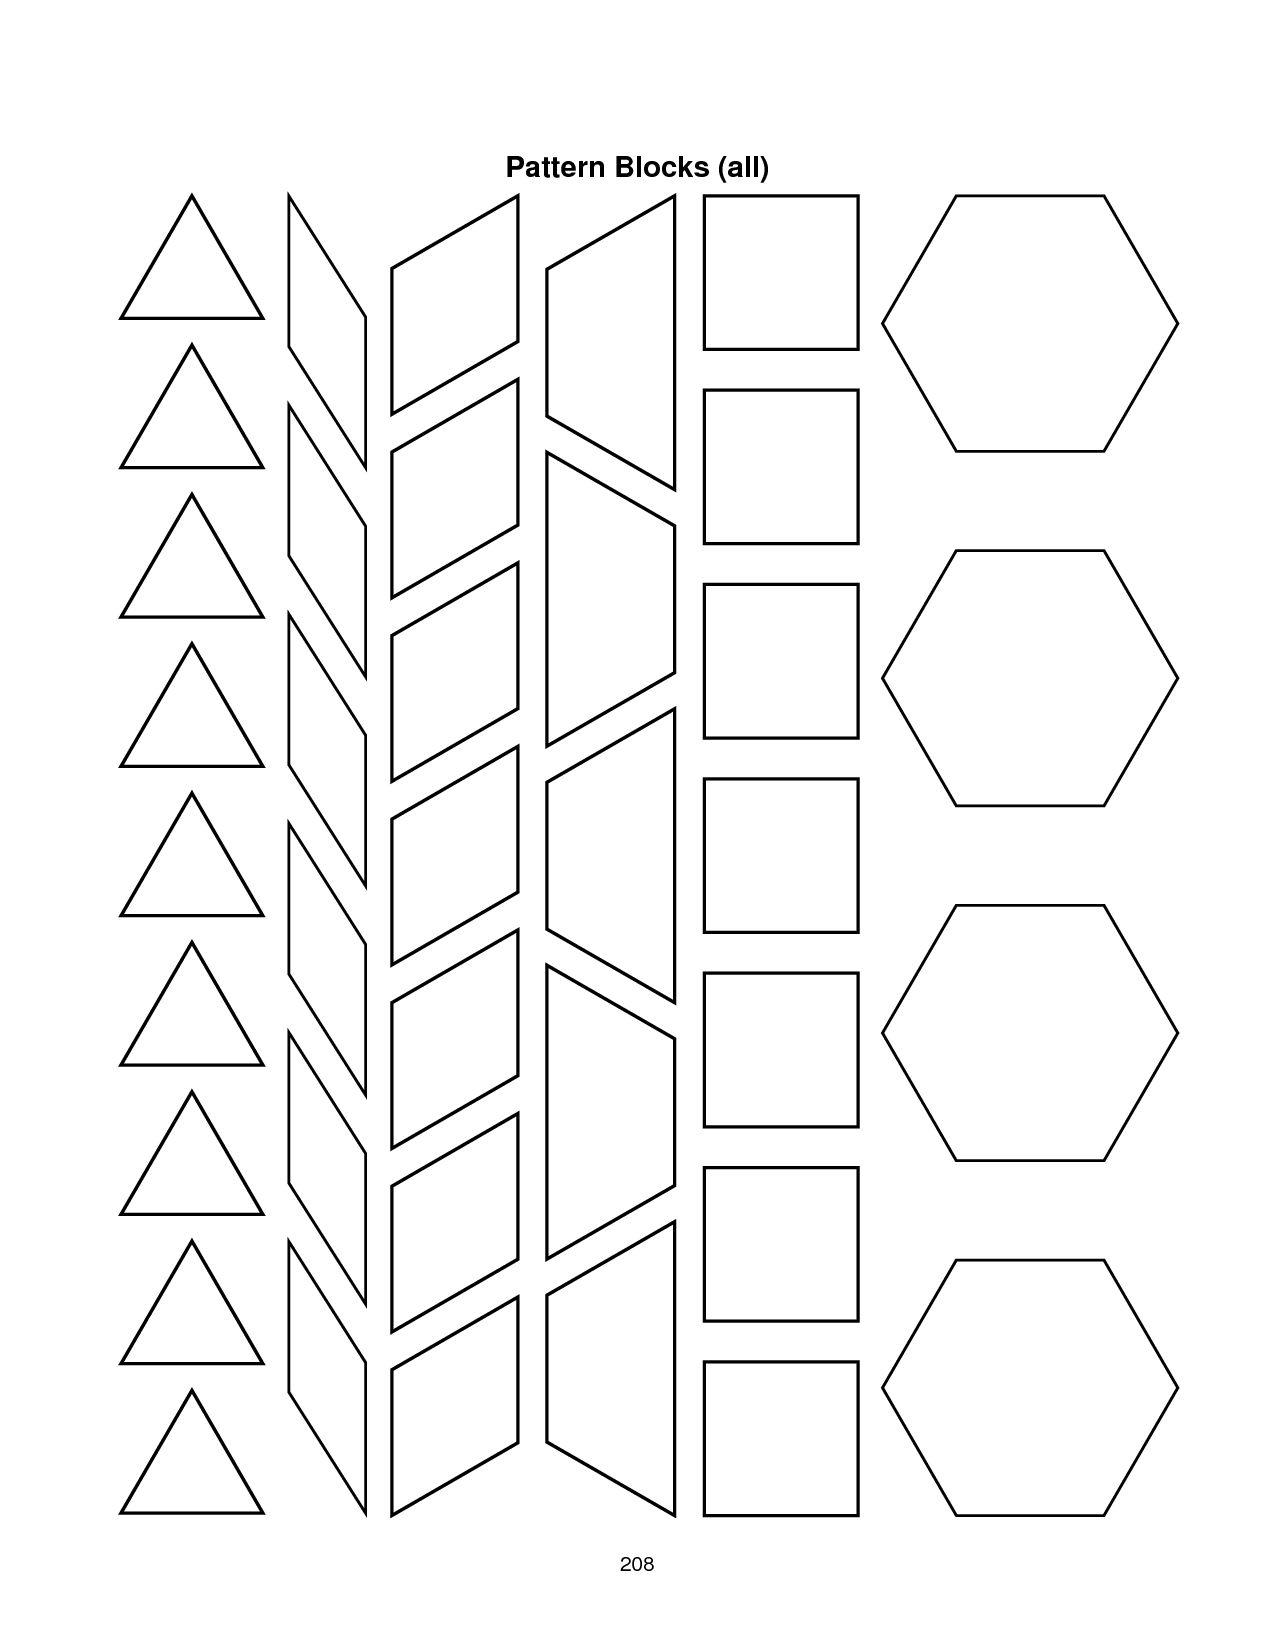 28 Images Of Blank Alphabet Pattern Block Template   Migapps with Blank Pattern  Block Templates…   Pattern block templates [ 1650 x 1275 Pixel ]